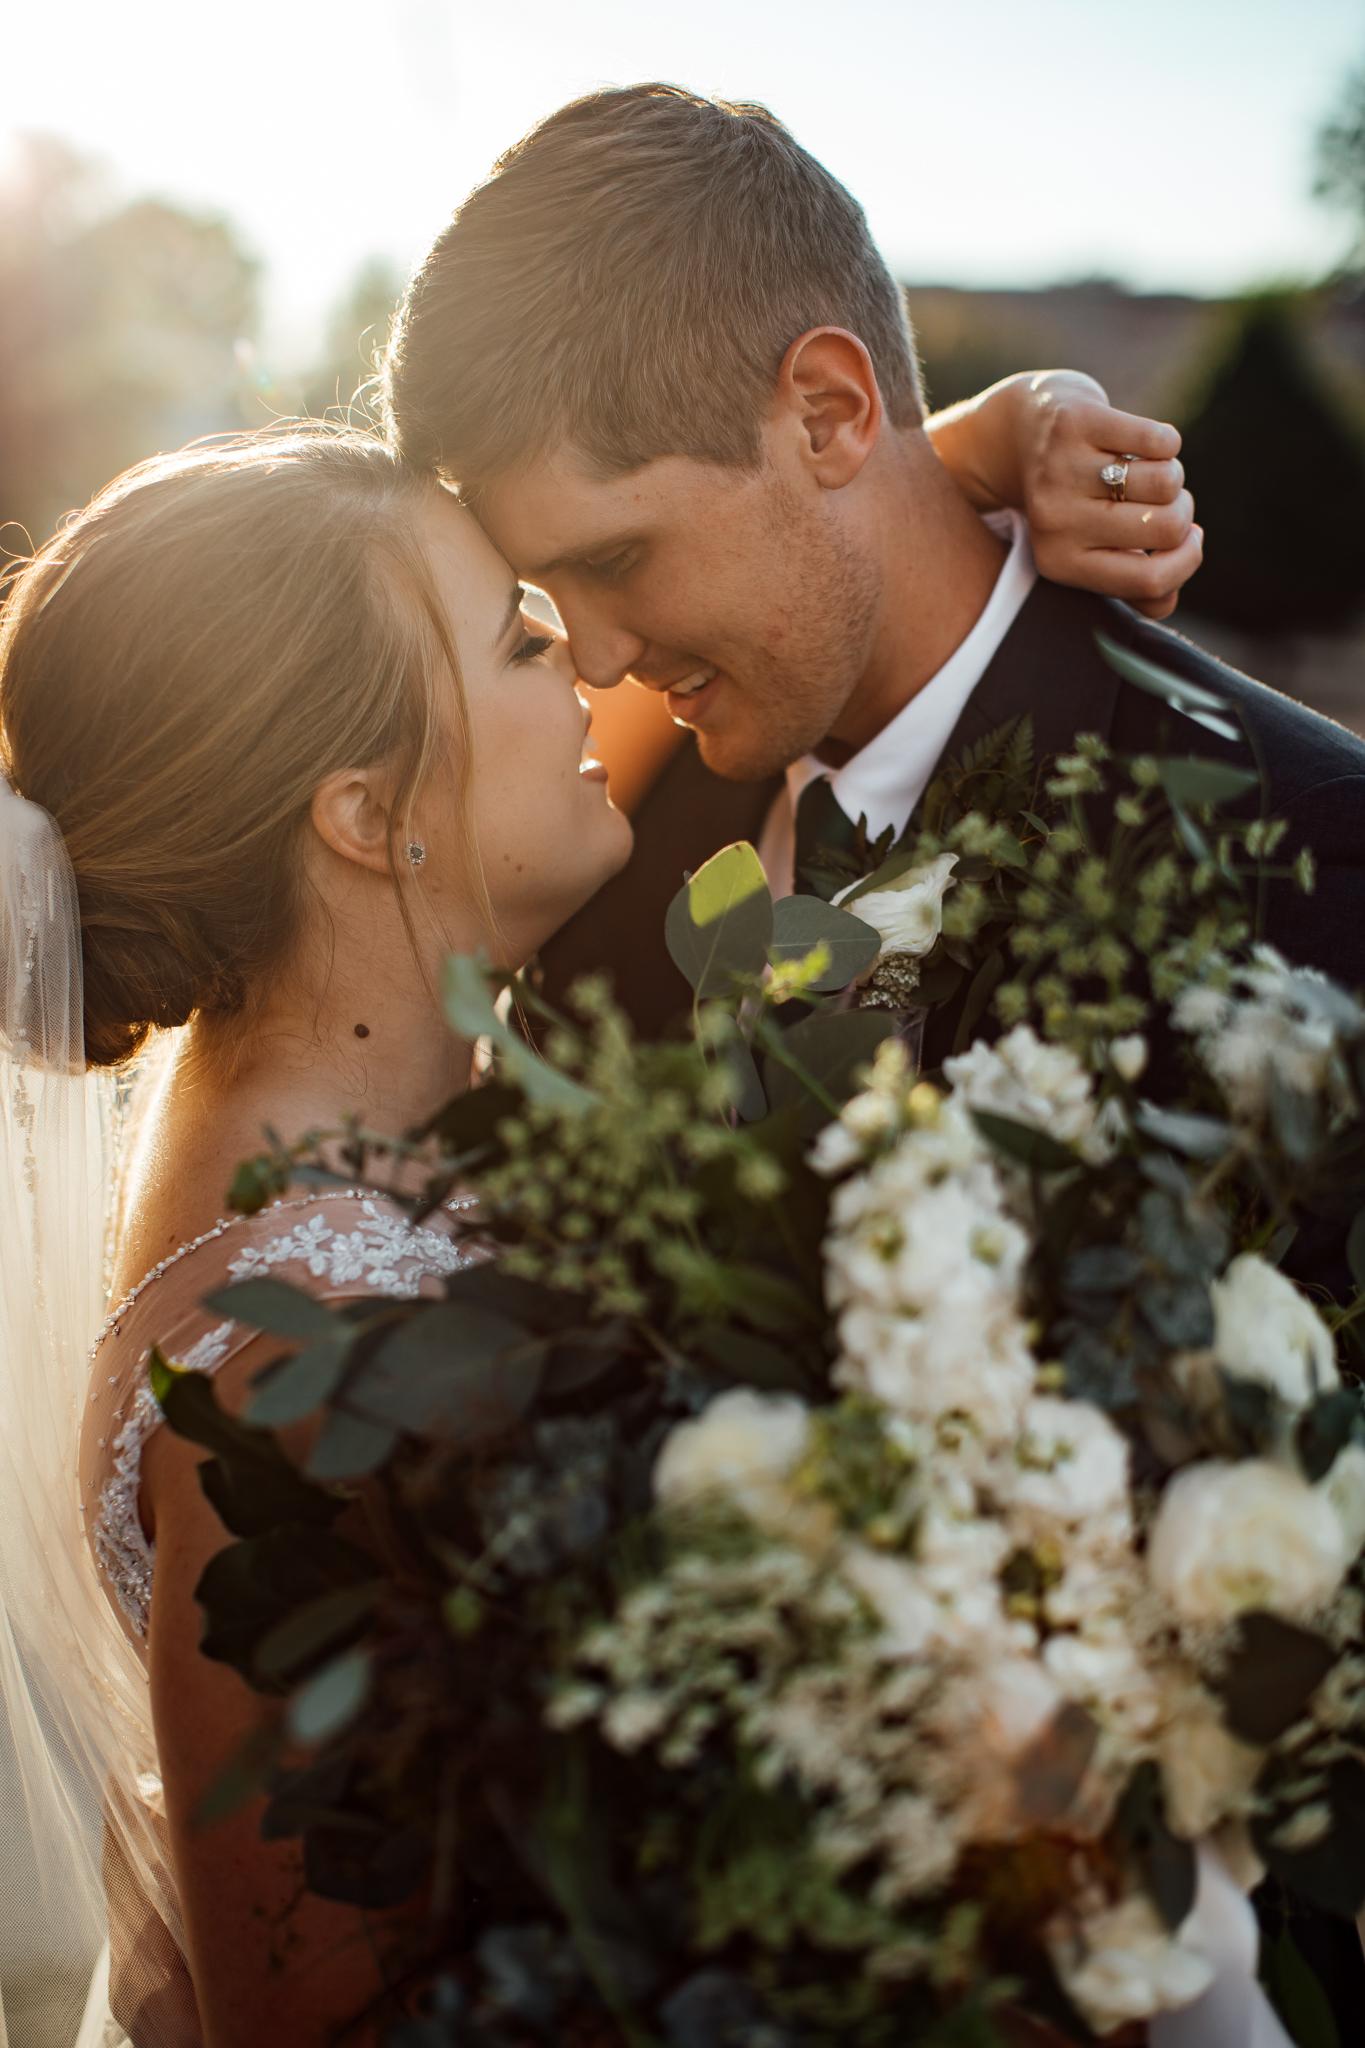 firstandgreen-grenada-ms-wedding-venue-thewarmtharoundyou-wedding-photographers (10 of 12).jpg